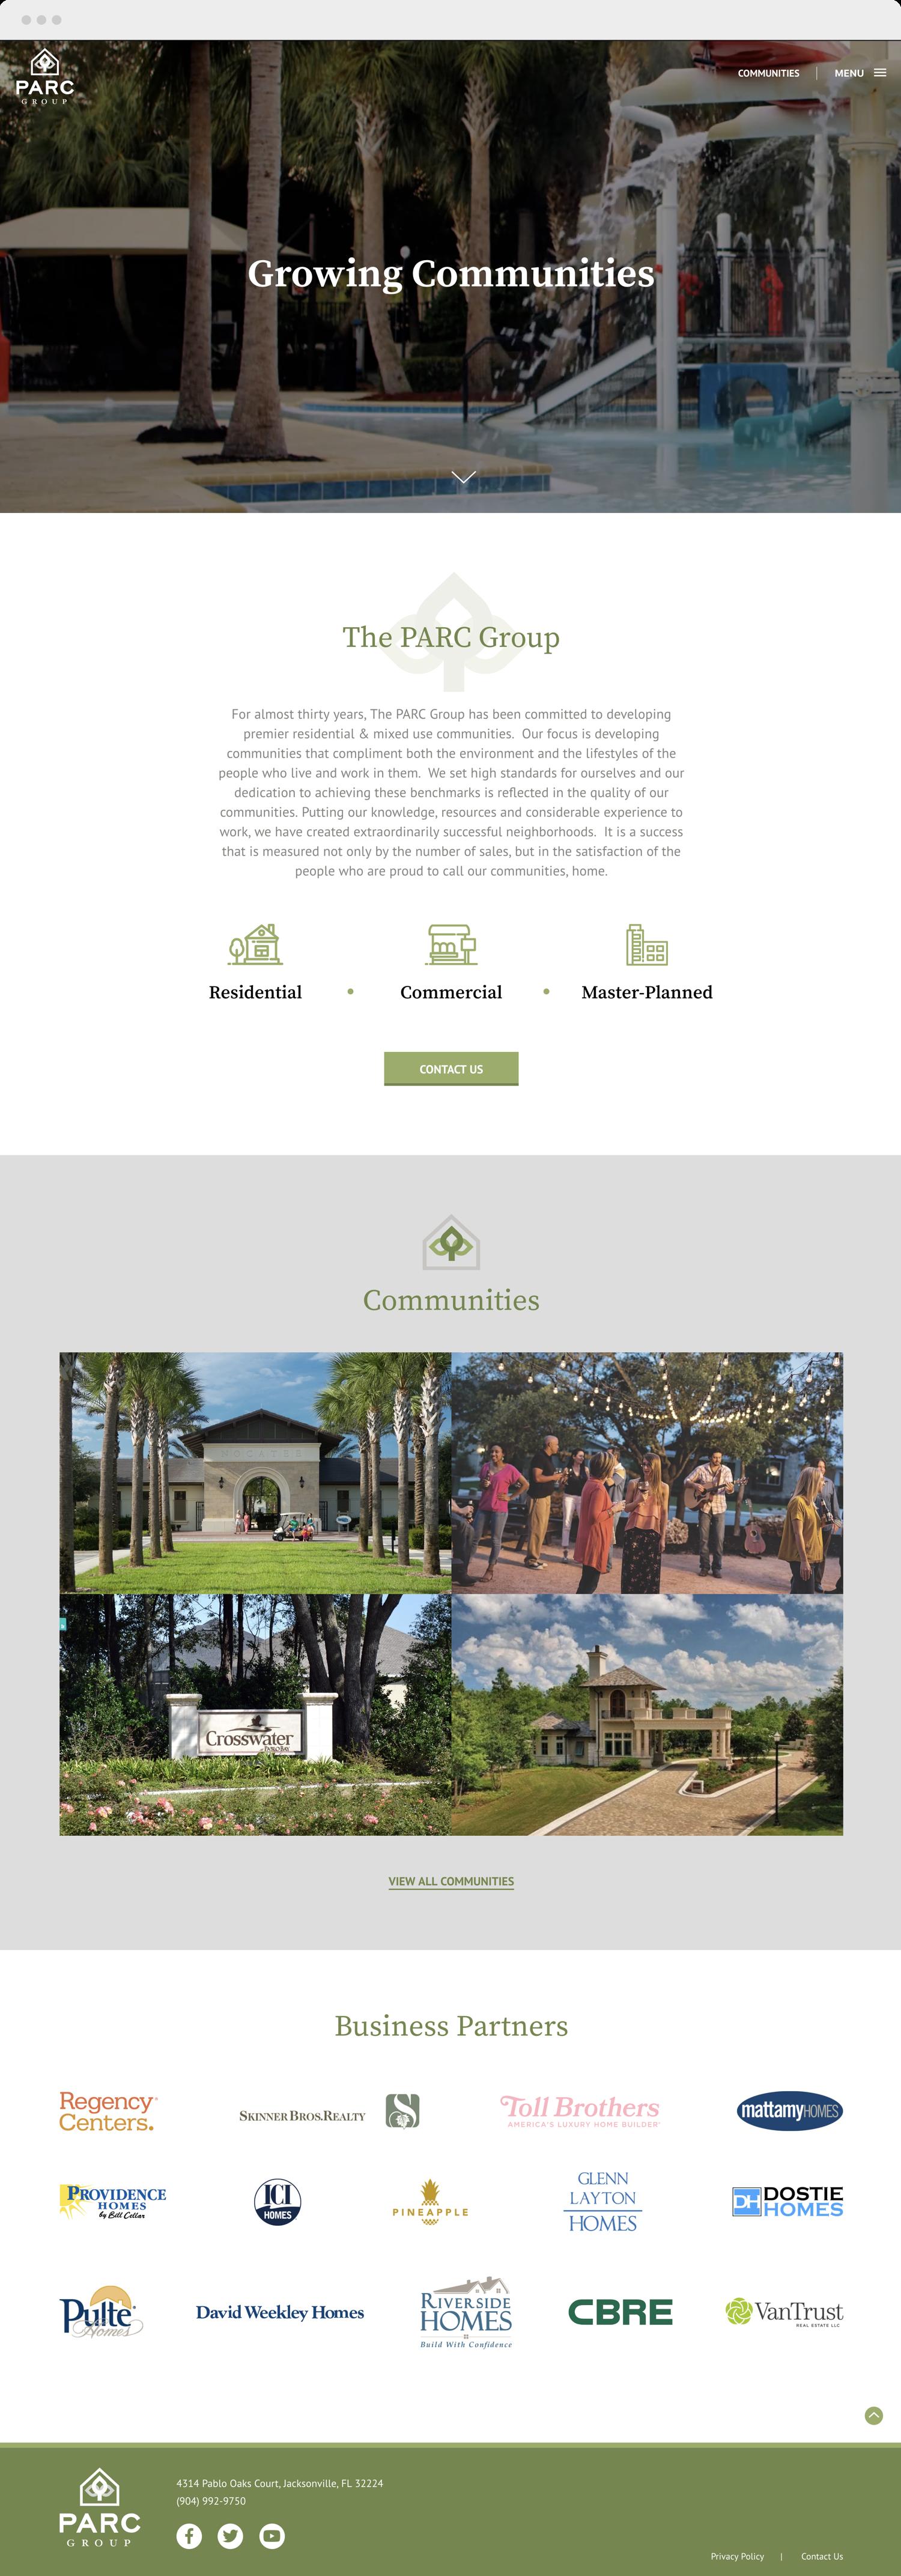 PARC Group home page website design